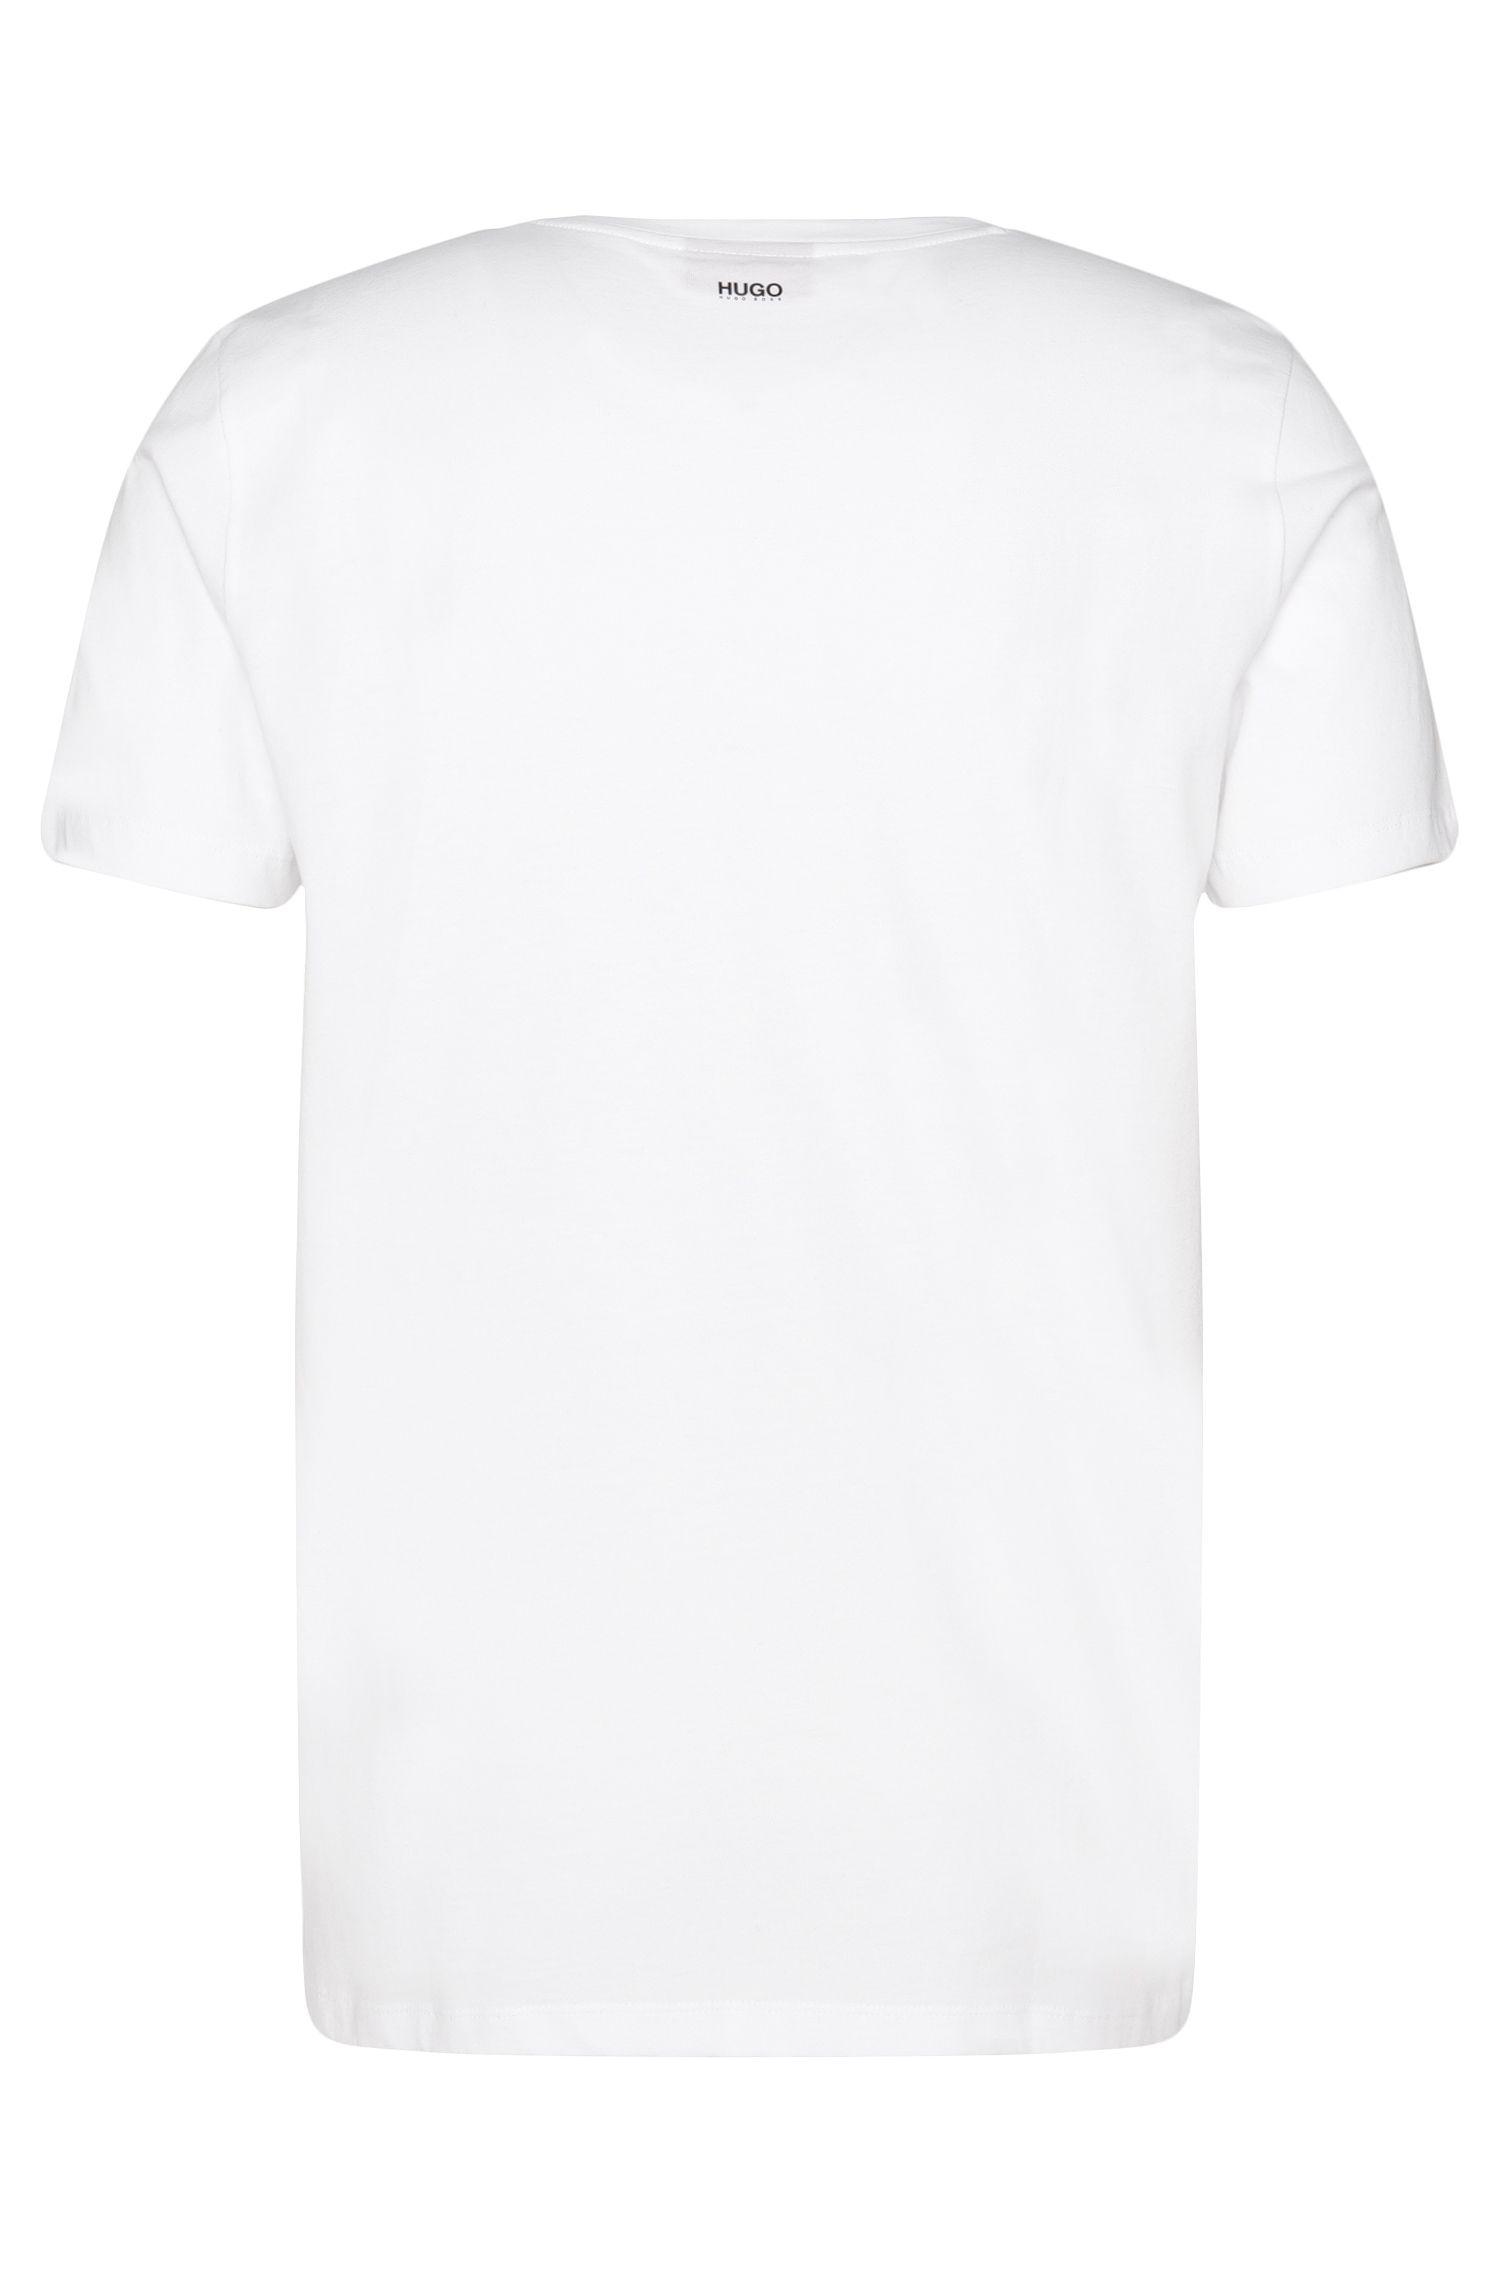 Loose-Fit T-Shirt aus Baumwolle mit gummiertem Print: 'Dorved'